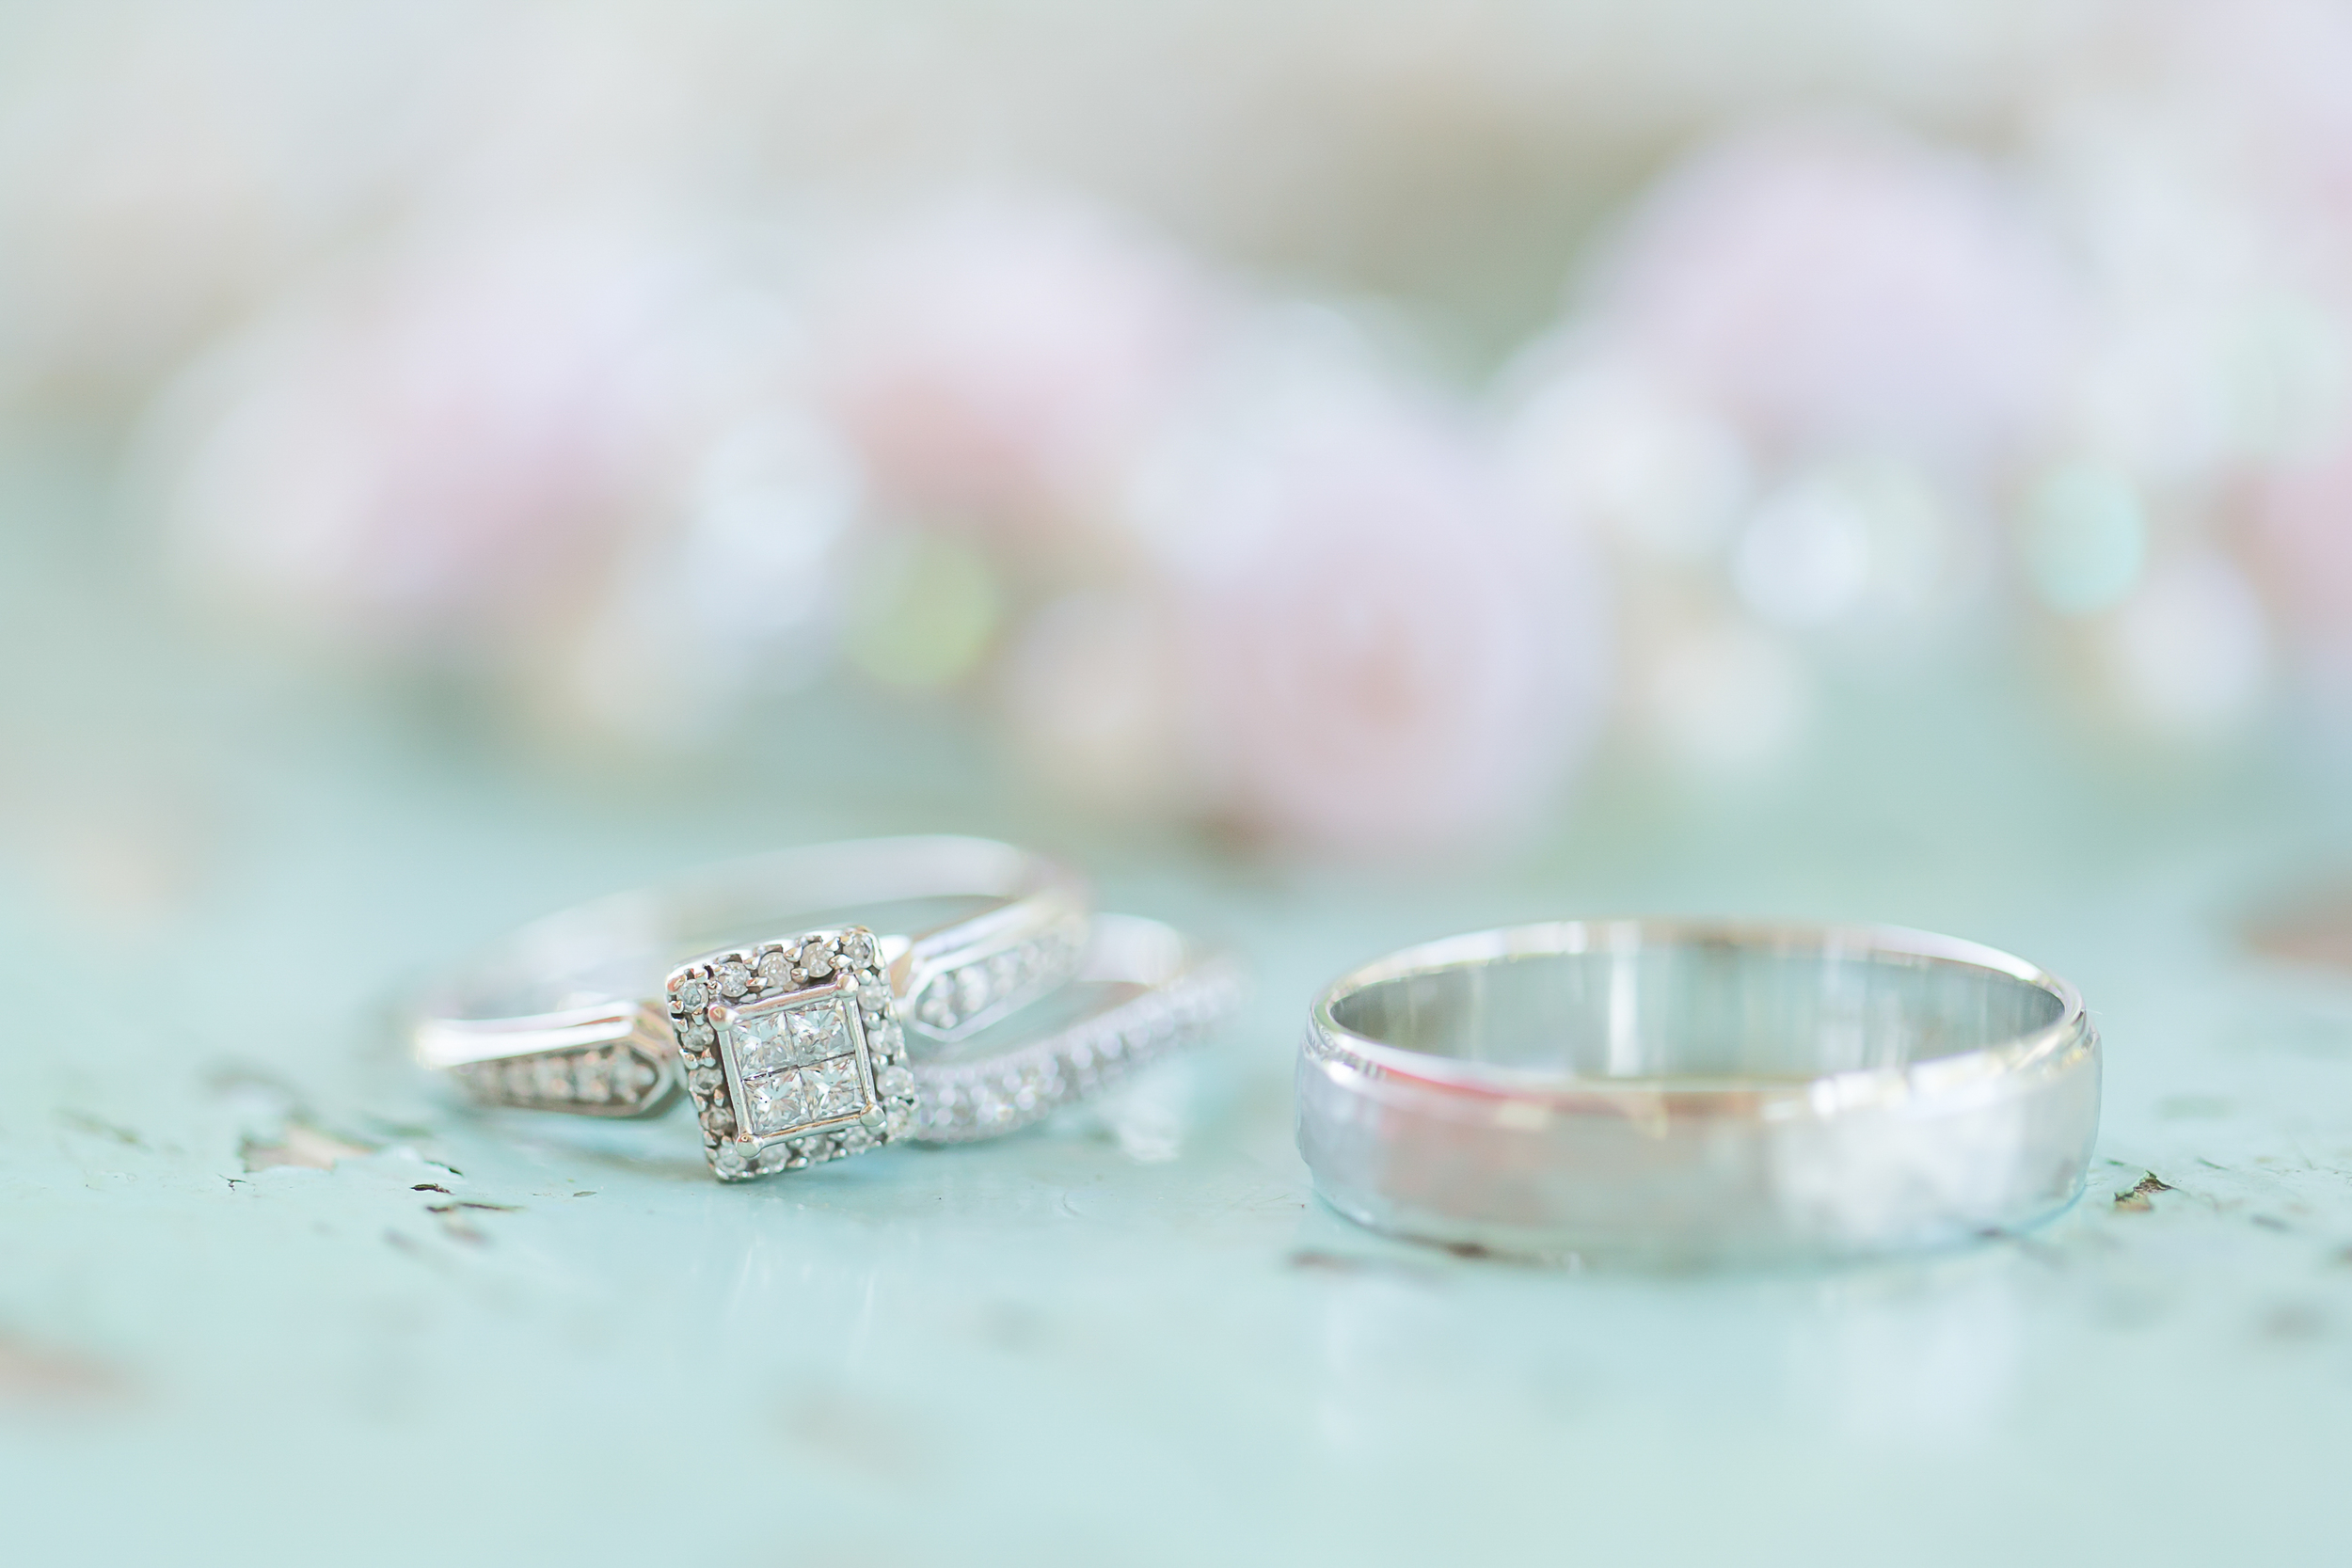 Jared Galleria Of Jewelry | Wedding Band Set | Diamonds | Amy Brown Photography